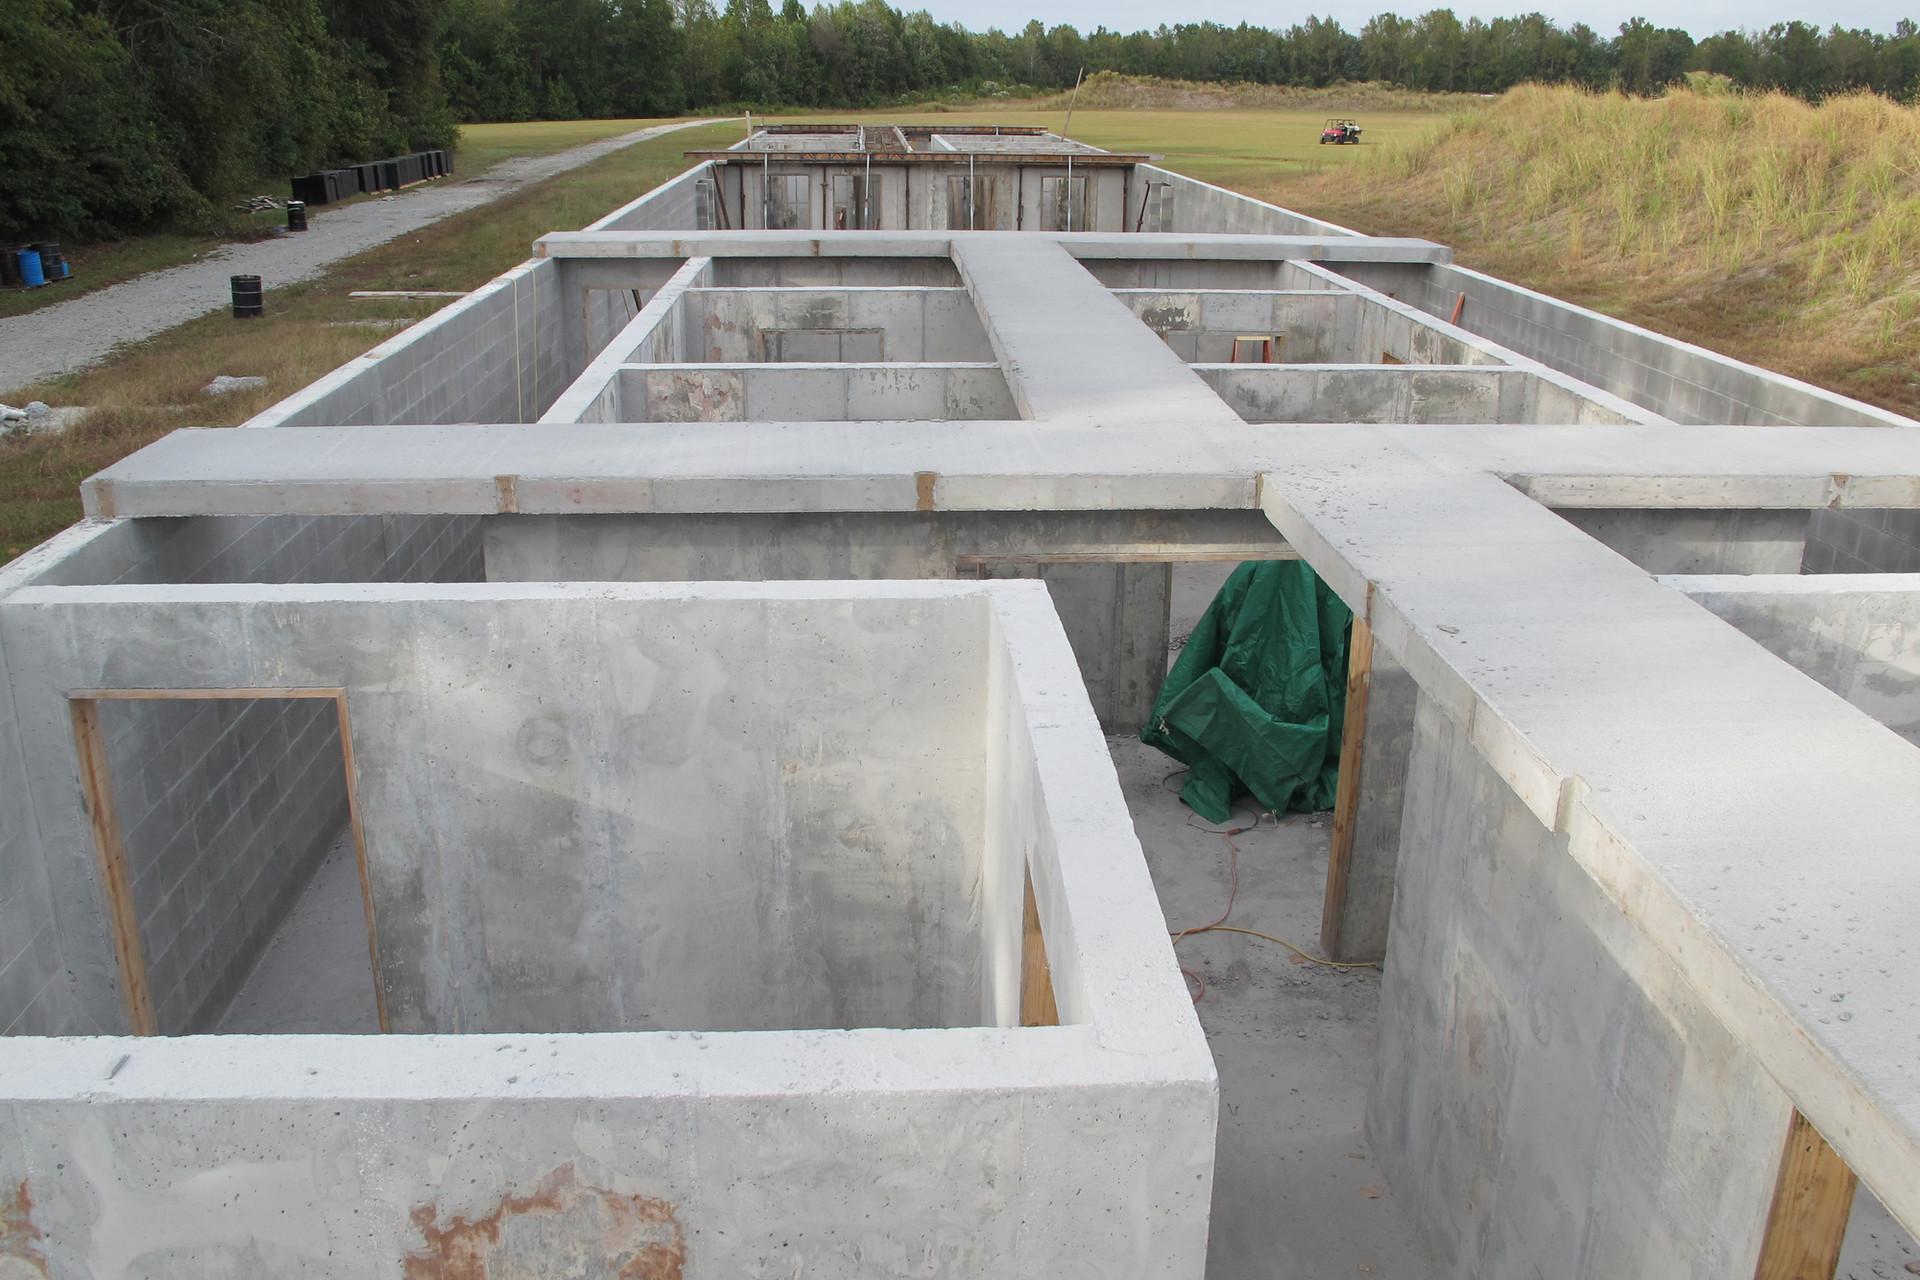 Poured Concrete over Rebar Construction